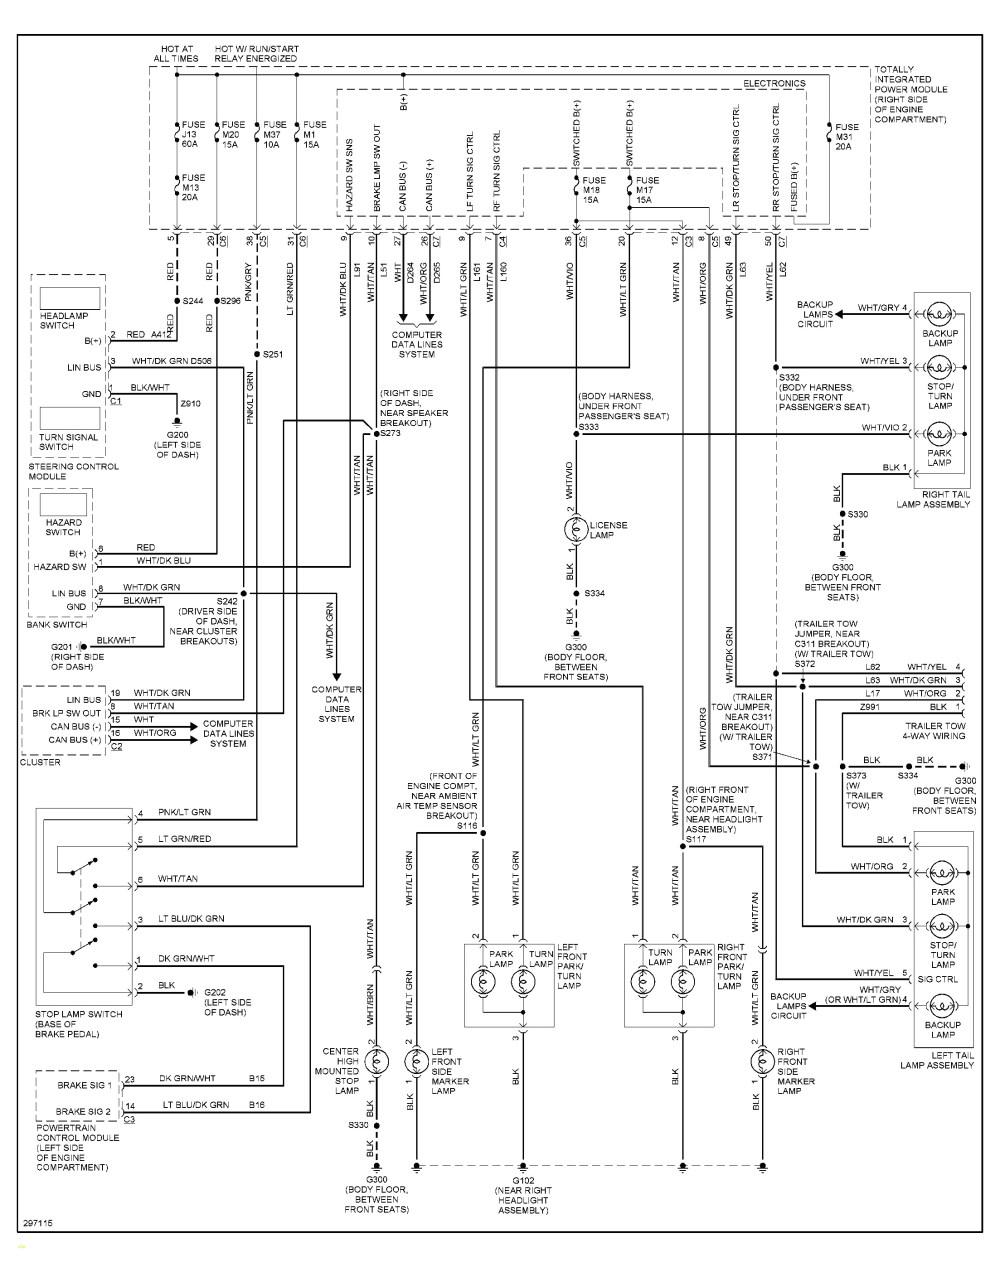 medium resolution of 2004 jeep grand cherokee wiring harness diagram today wiring diagram 2004 jeep grand cherokee